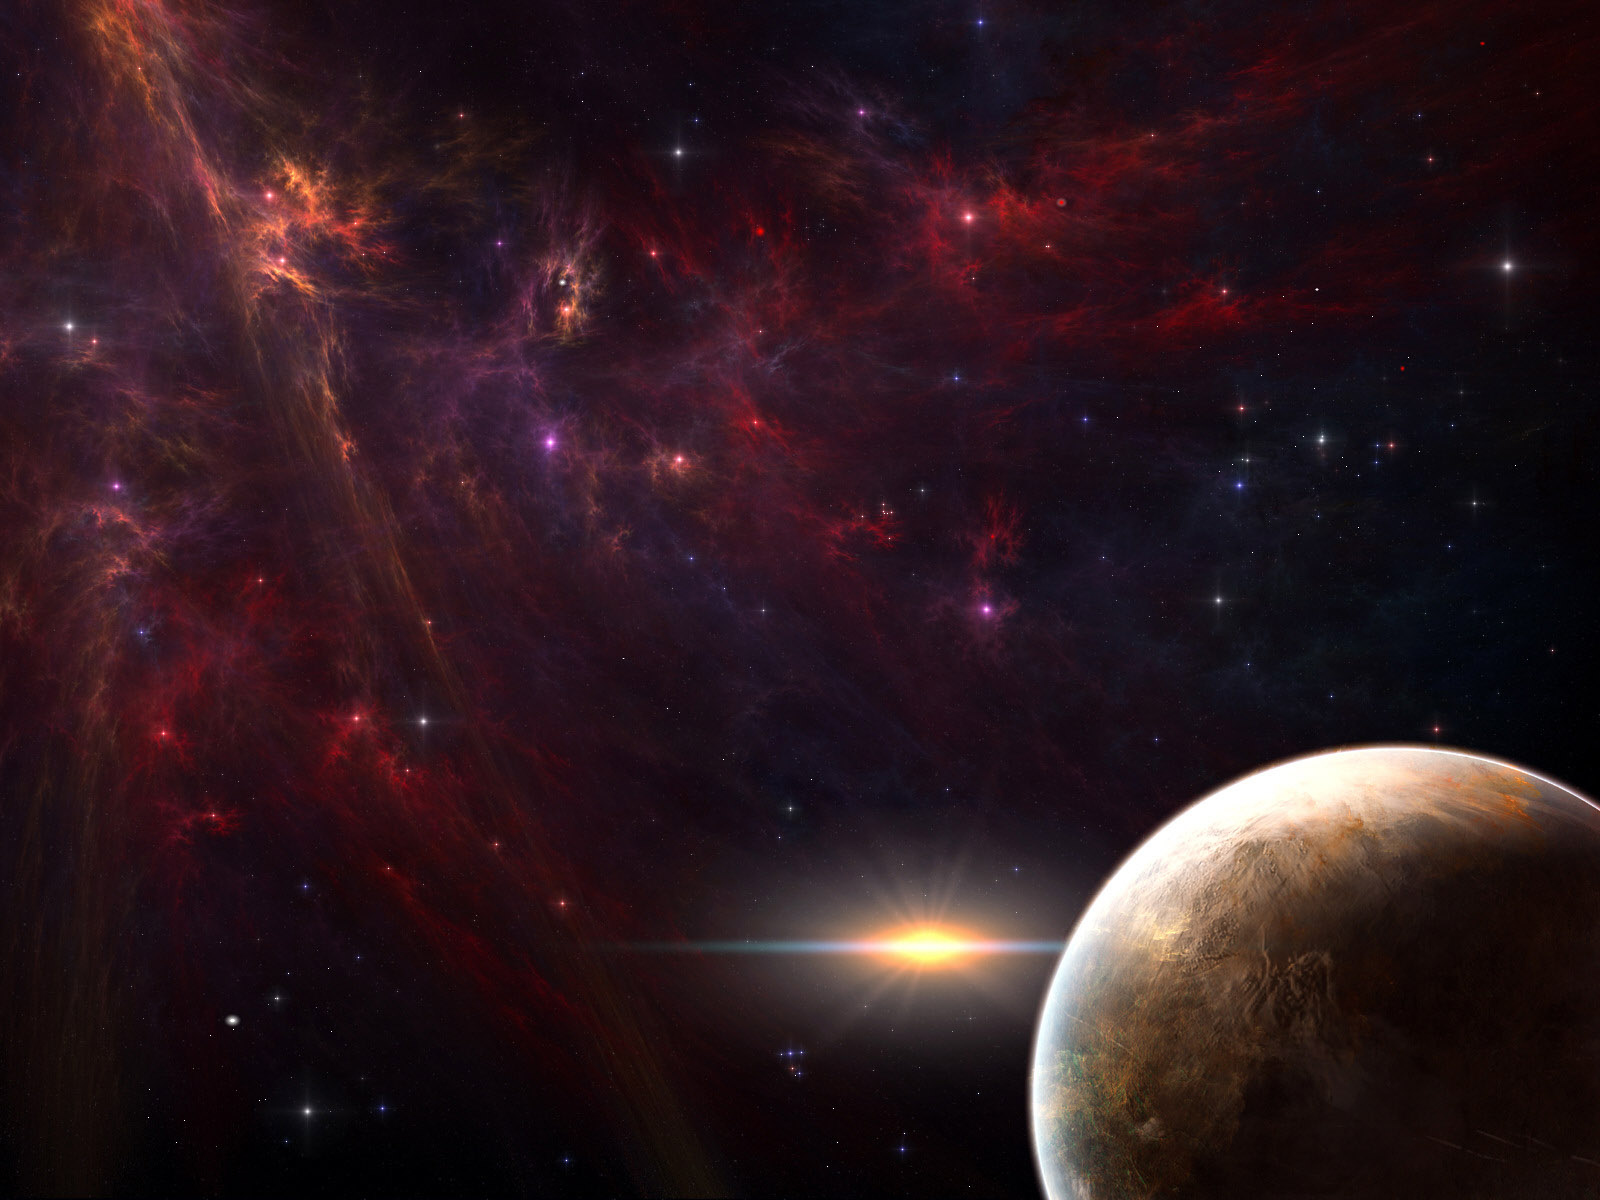 http://2.bp.blogspot.com/-Ae6cWqLZt3o/TnsgJCDKpeI/AAAAAAAAATc/ja6H-BwnYO8/s1600/distant_galaxy-normal.jpg